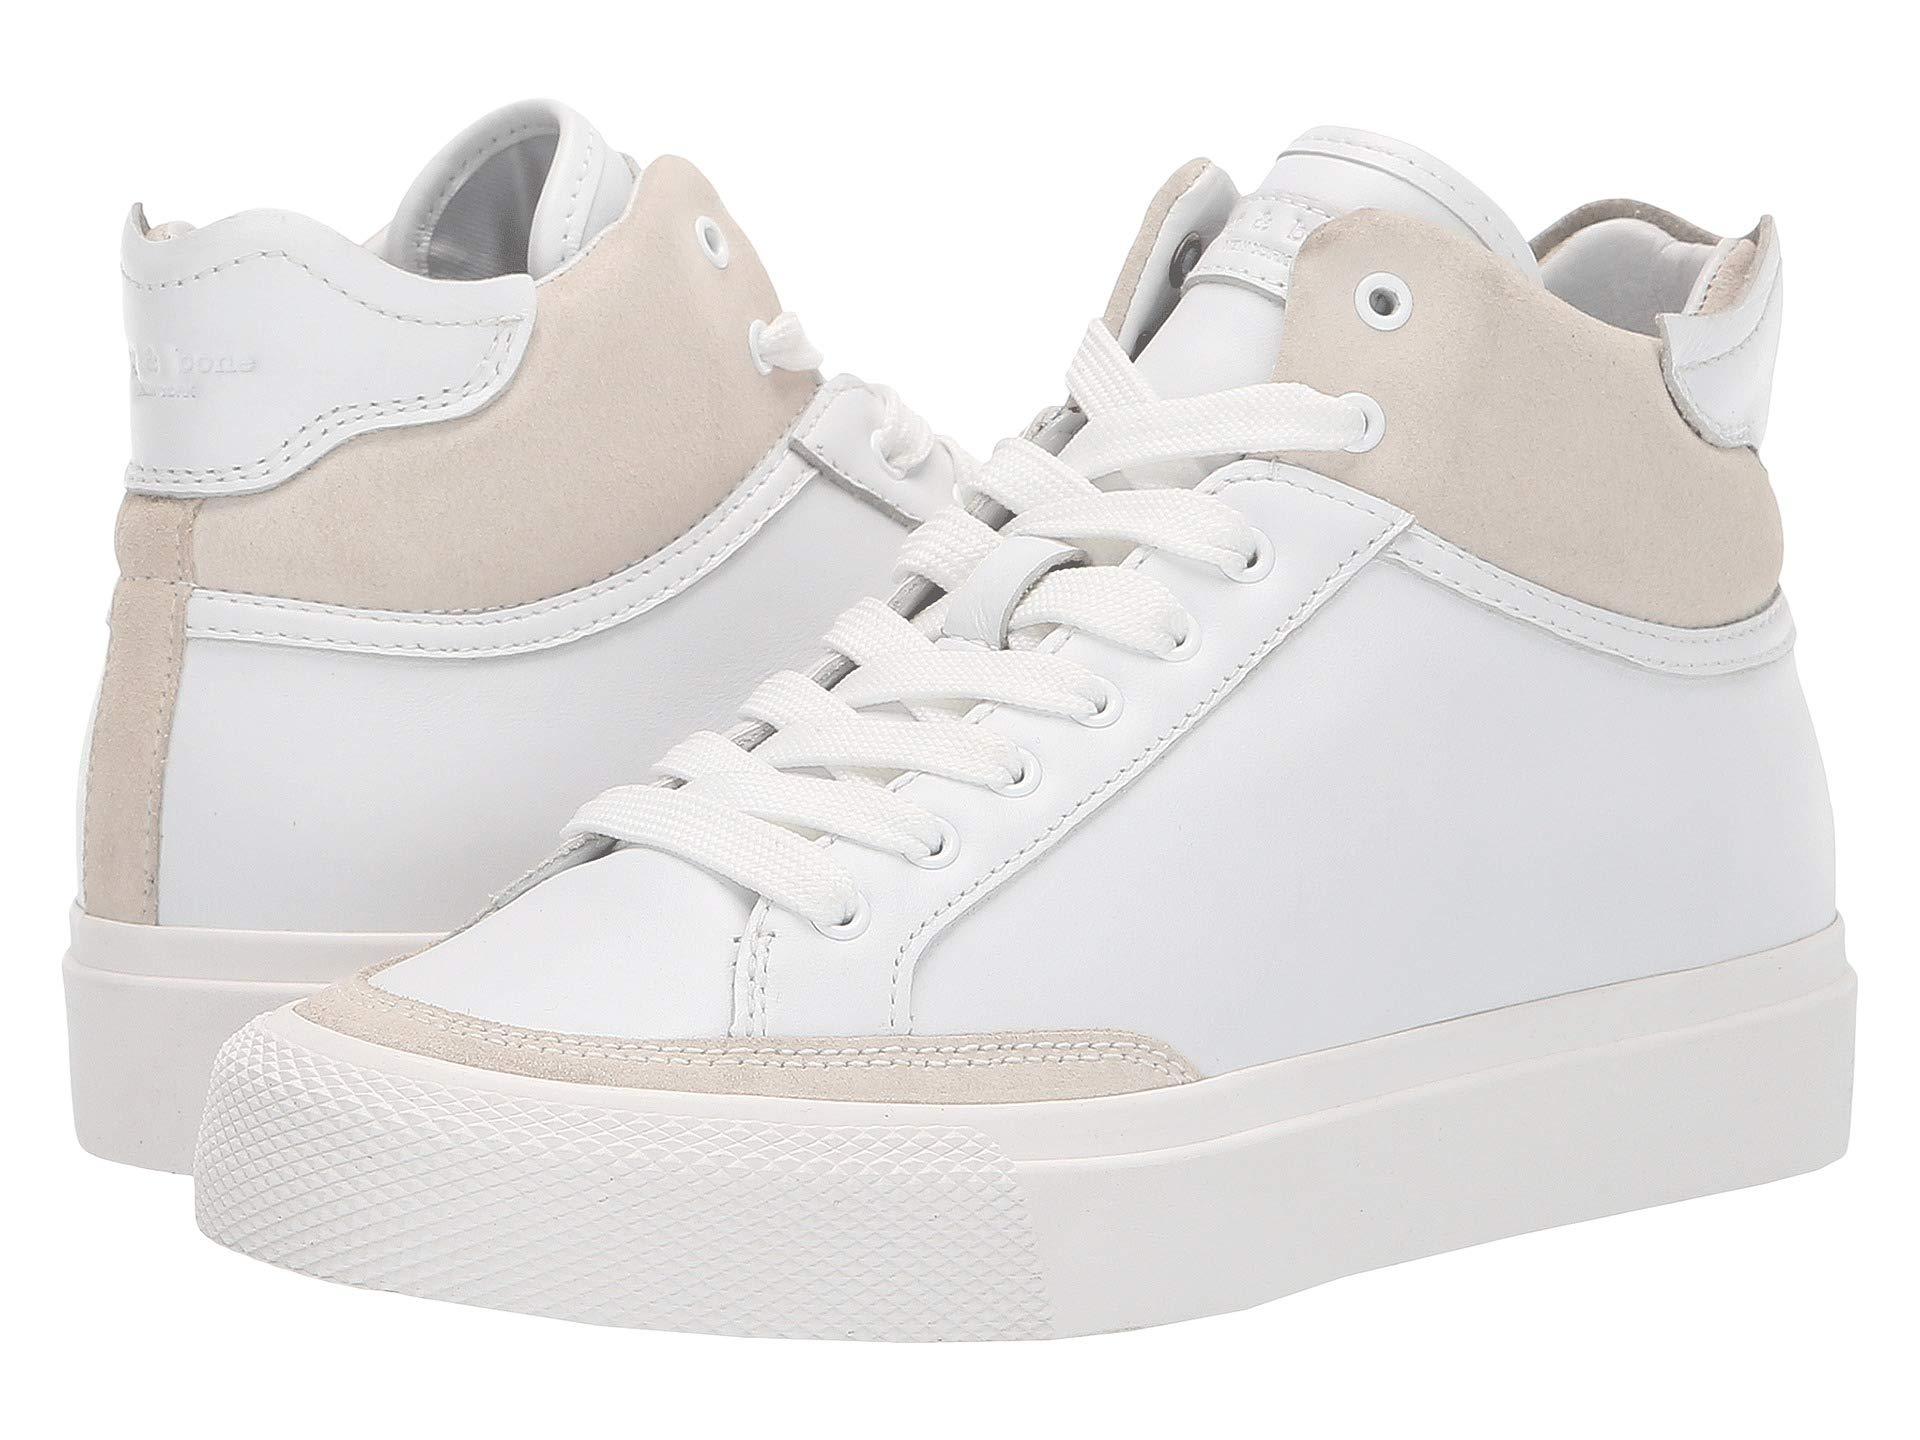 Bone Rag Sneaker High Rb amp; Army White Leather CqFHv5q